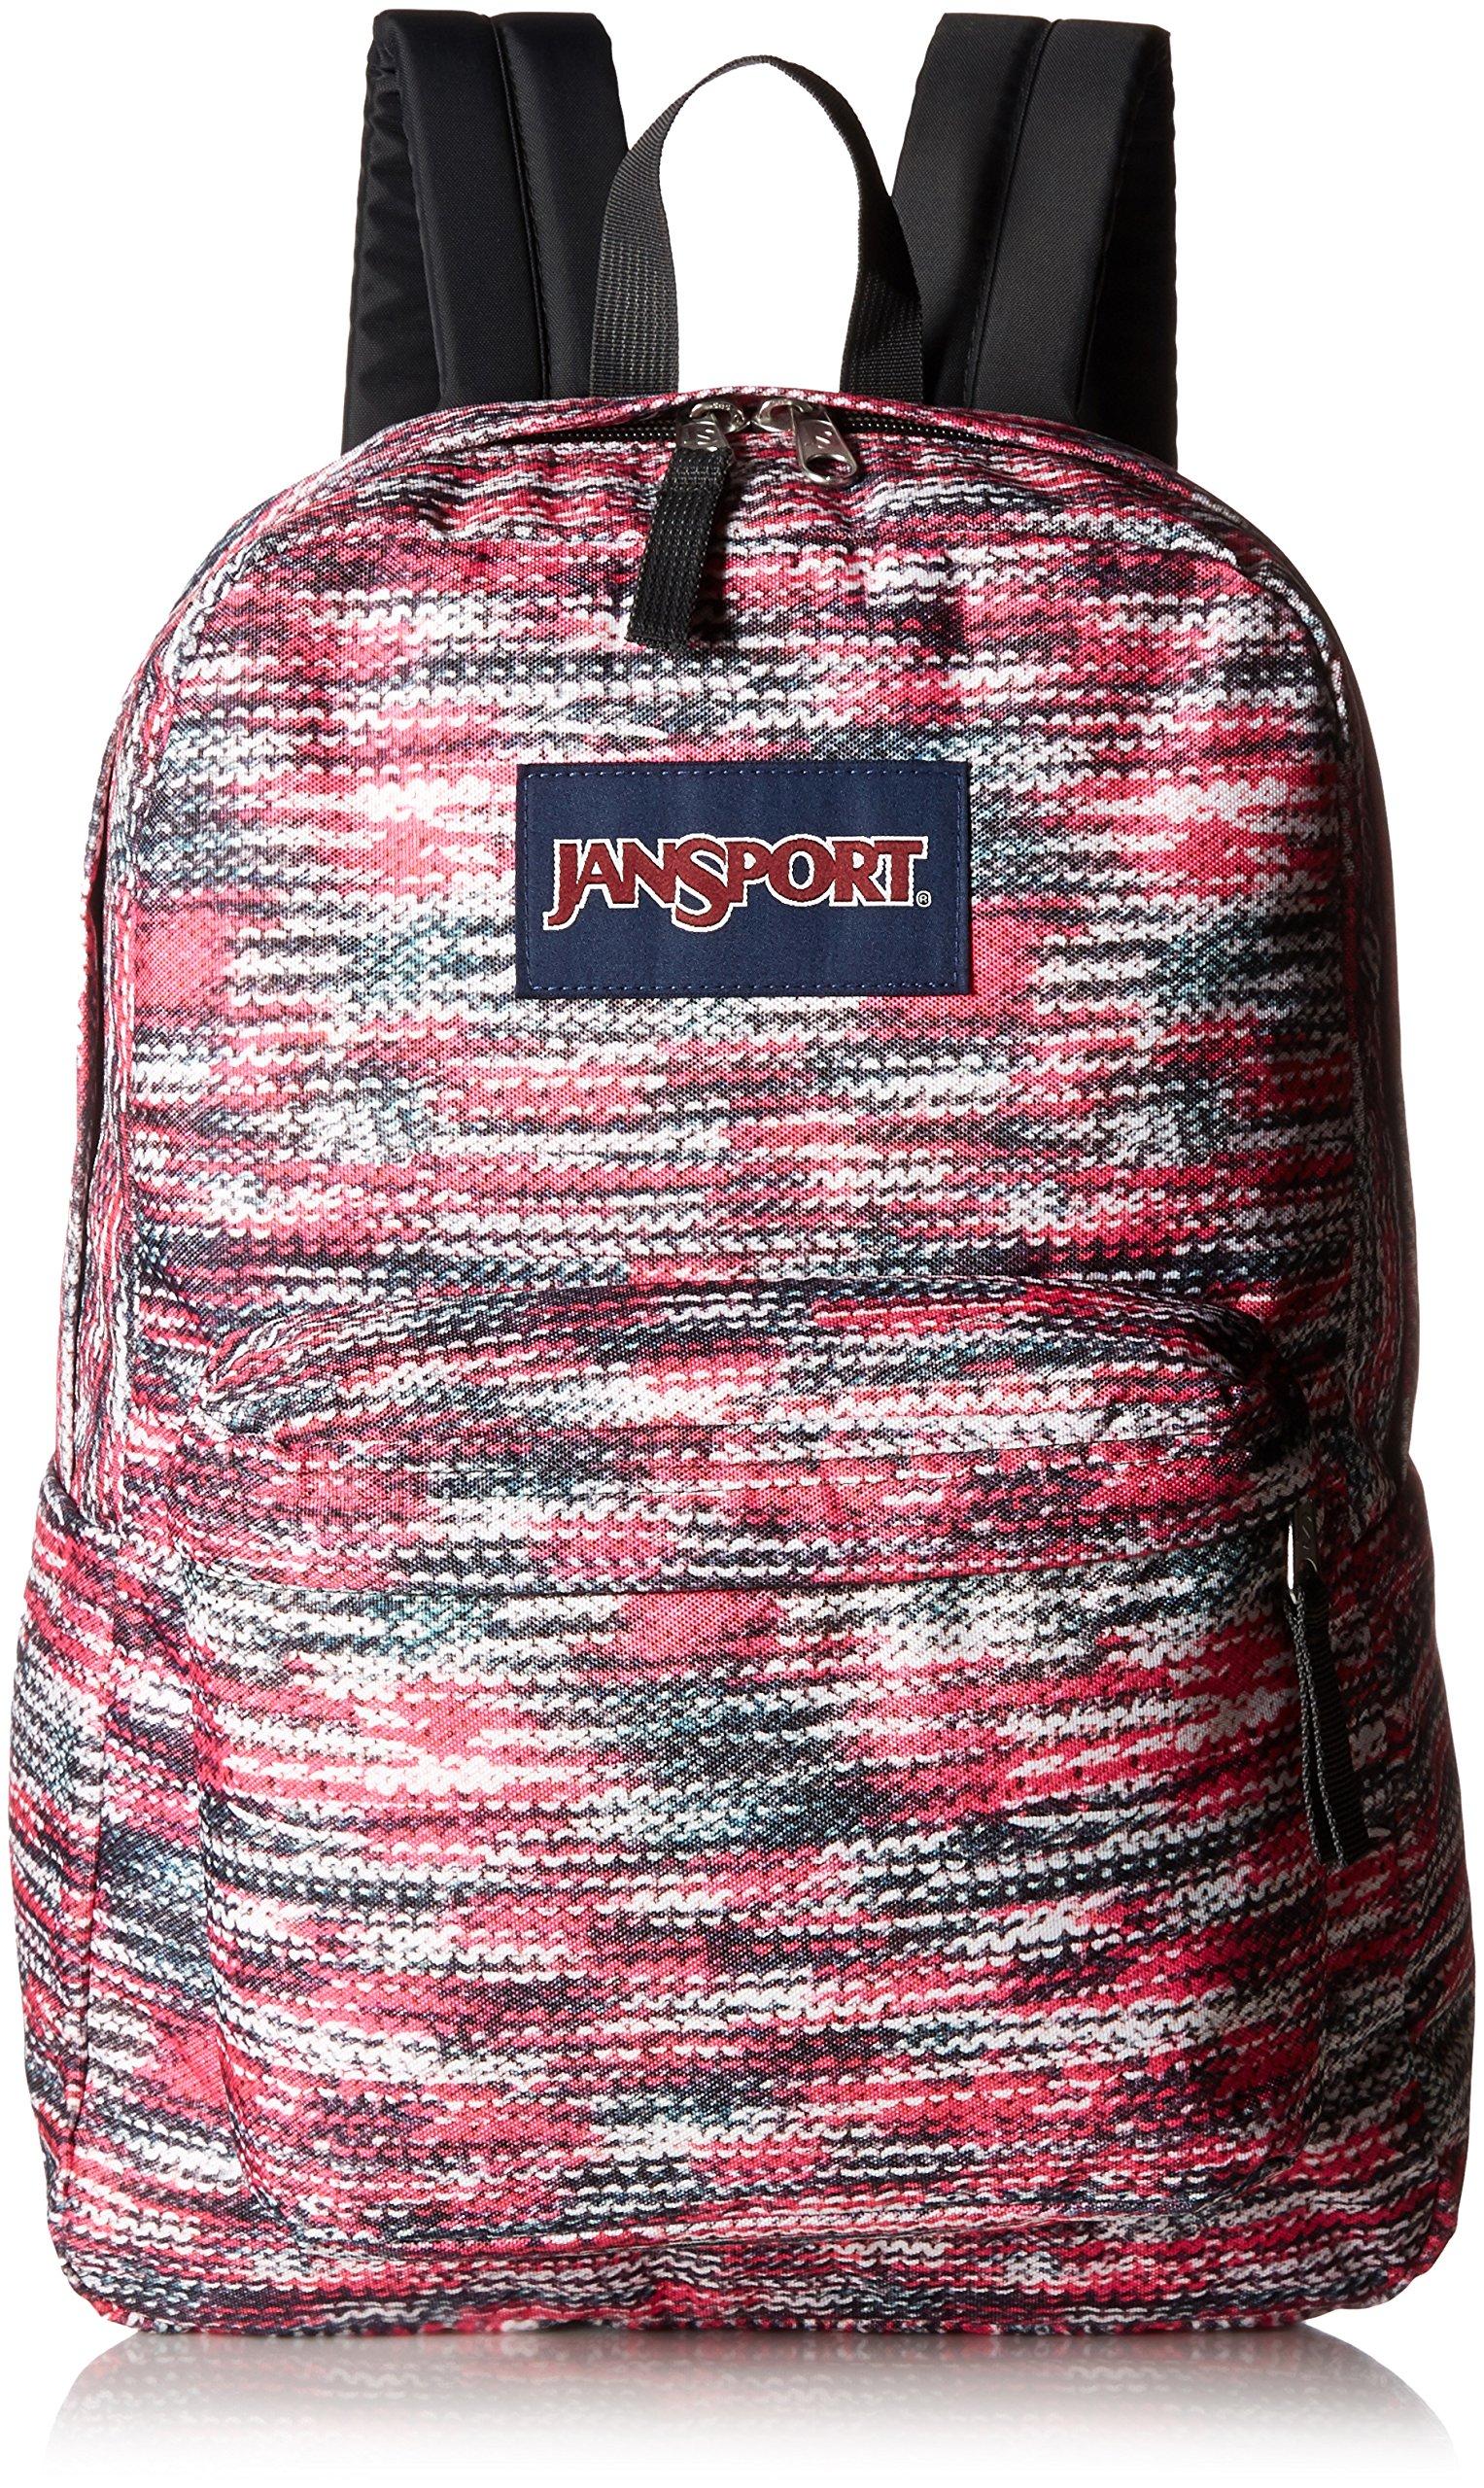 JanSport Unisex SuperBreak Multi Sweater Knit Backpack